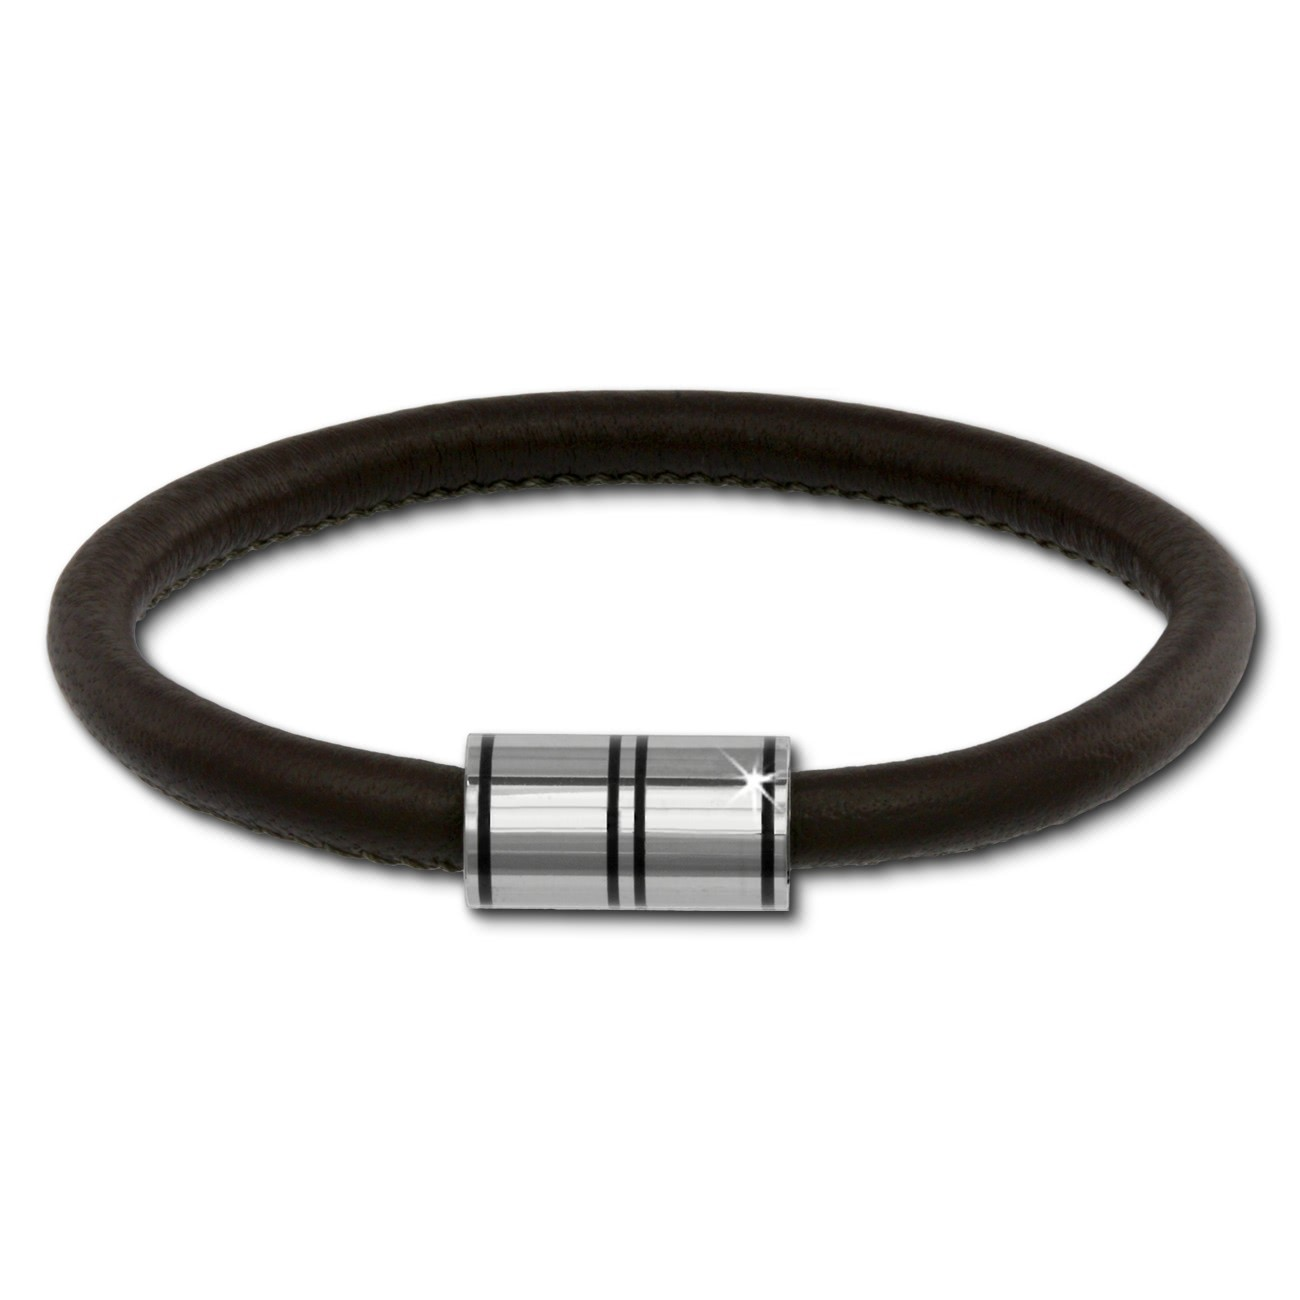 SilberDream Nappa Leder Armband braun 18cm Edelstahlverschluss LAB1118